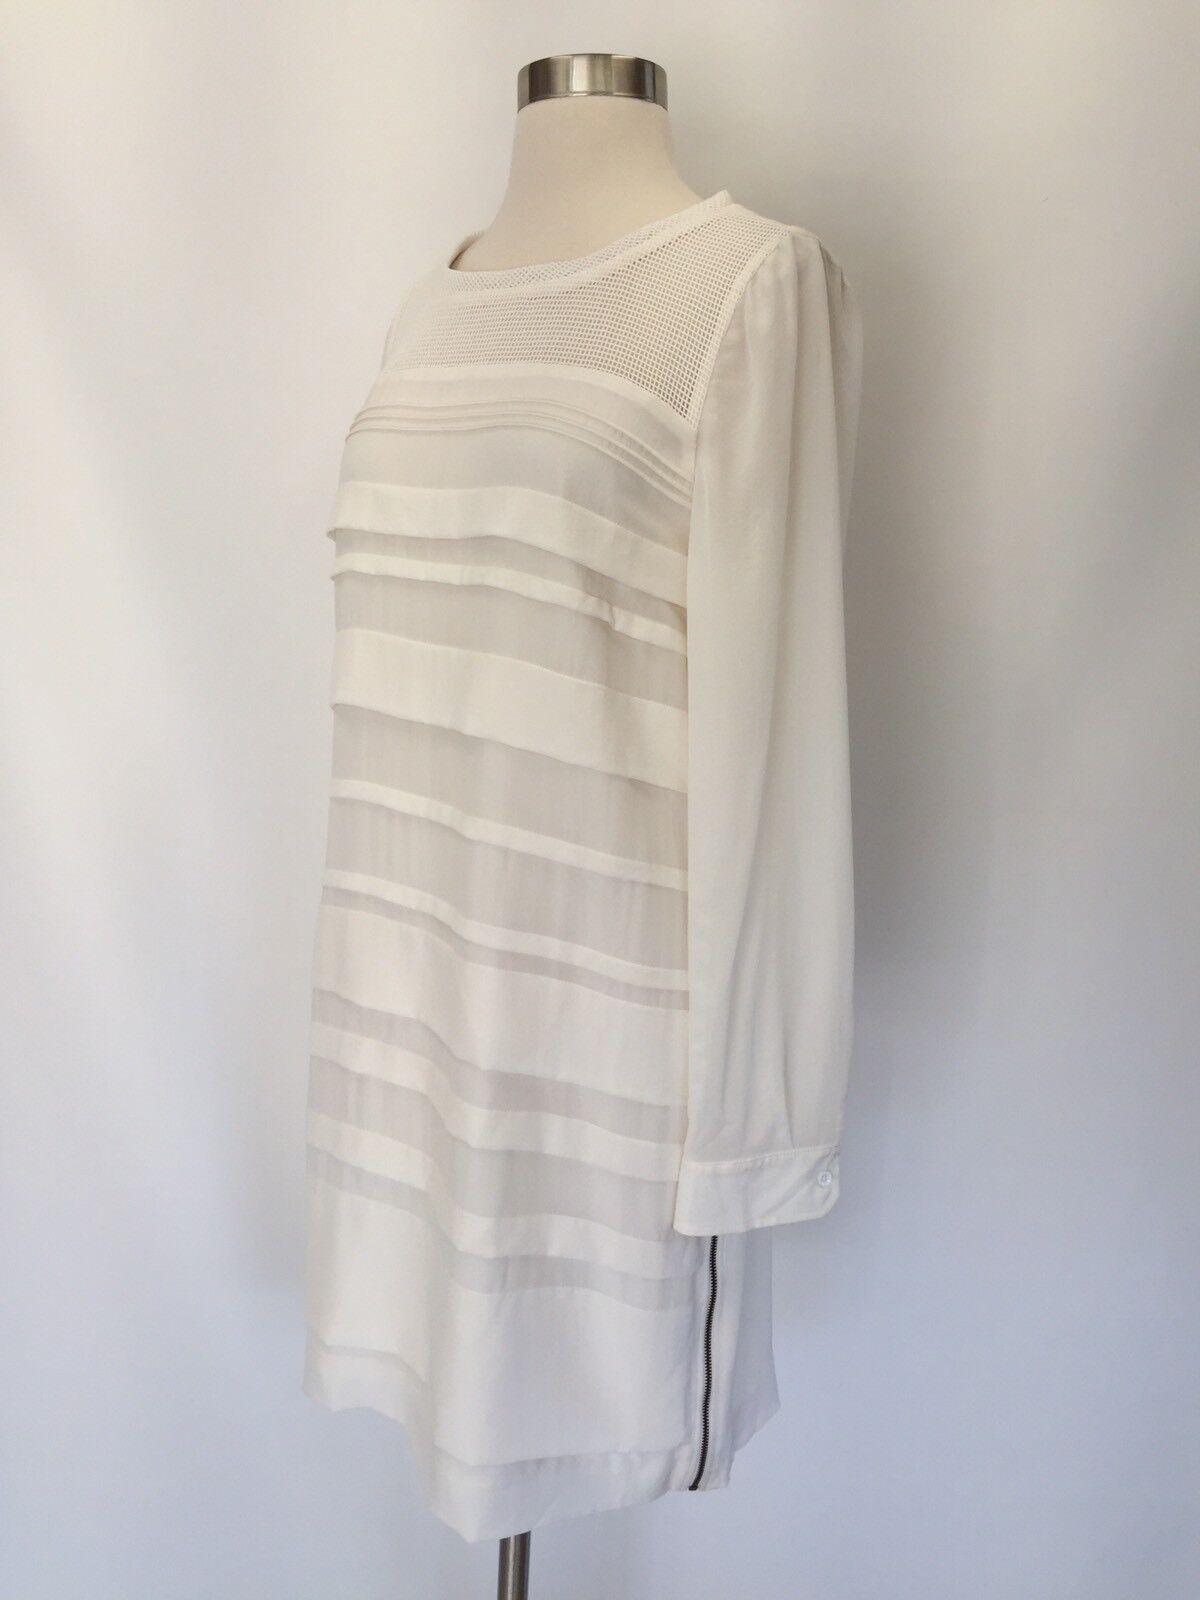 NEW J.CREW Collection Darlington Shift Silk Dress Zipper Marine Salt Ivory Sz 6